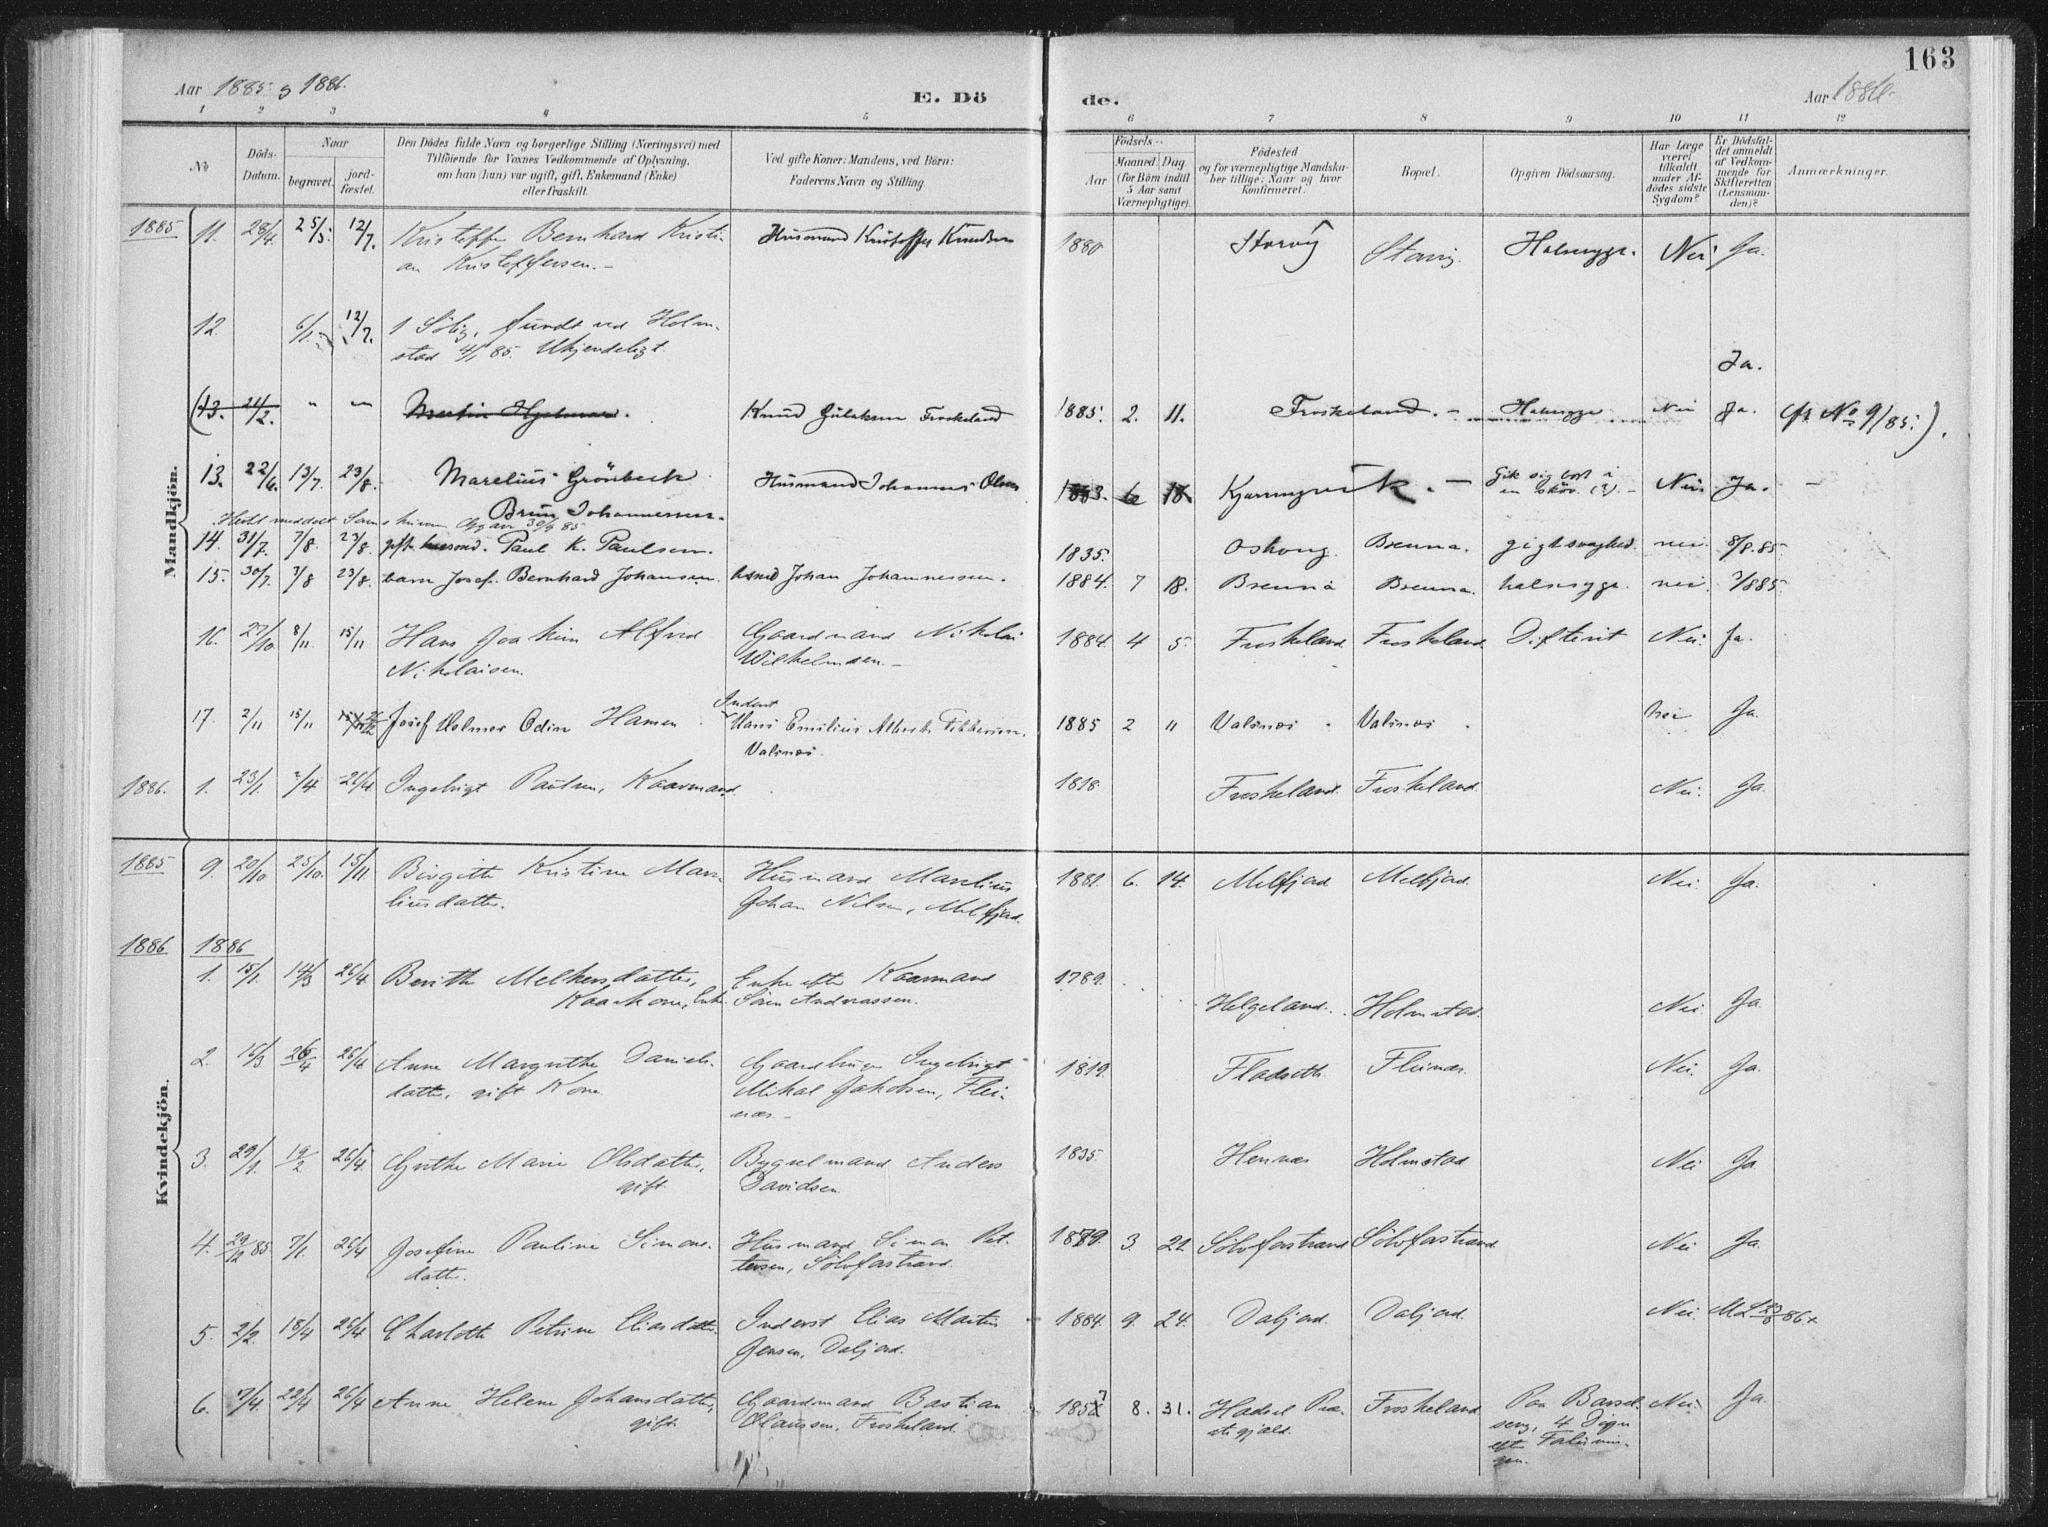 SAT, Ministerialprotokoller, klokkerbøker og fødselsregistre - Nordland, 890/L1286: Ministerialbok nr. 890A01, 1882-1902, s. 163